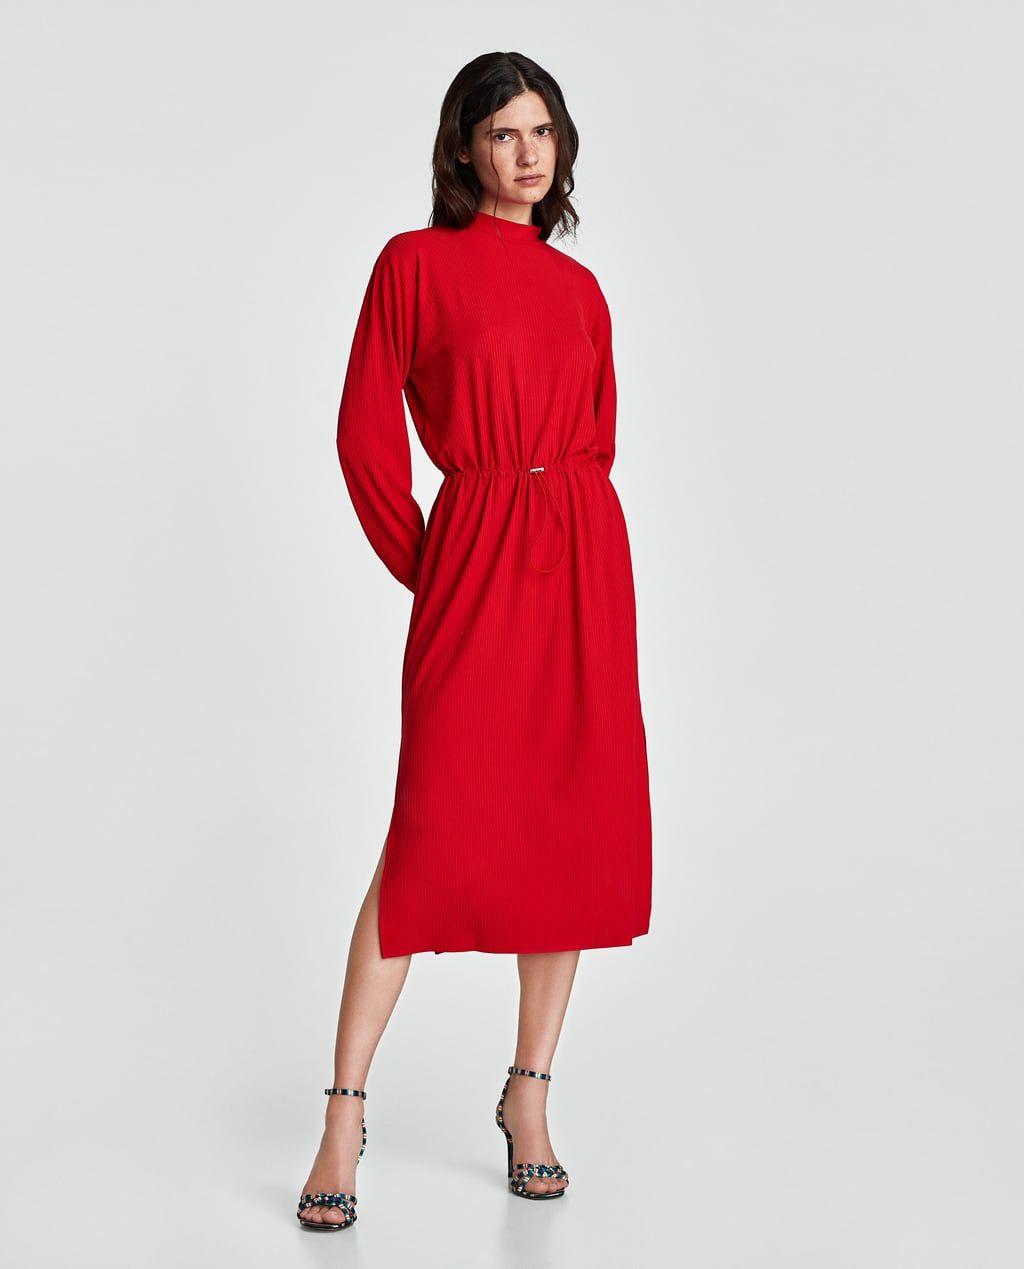 9c0a1810c869 RIBBED DRESS-Midi-DRESSES-WOMAN